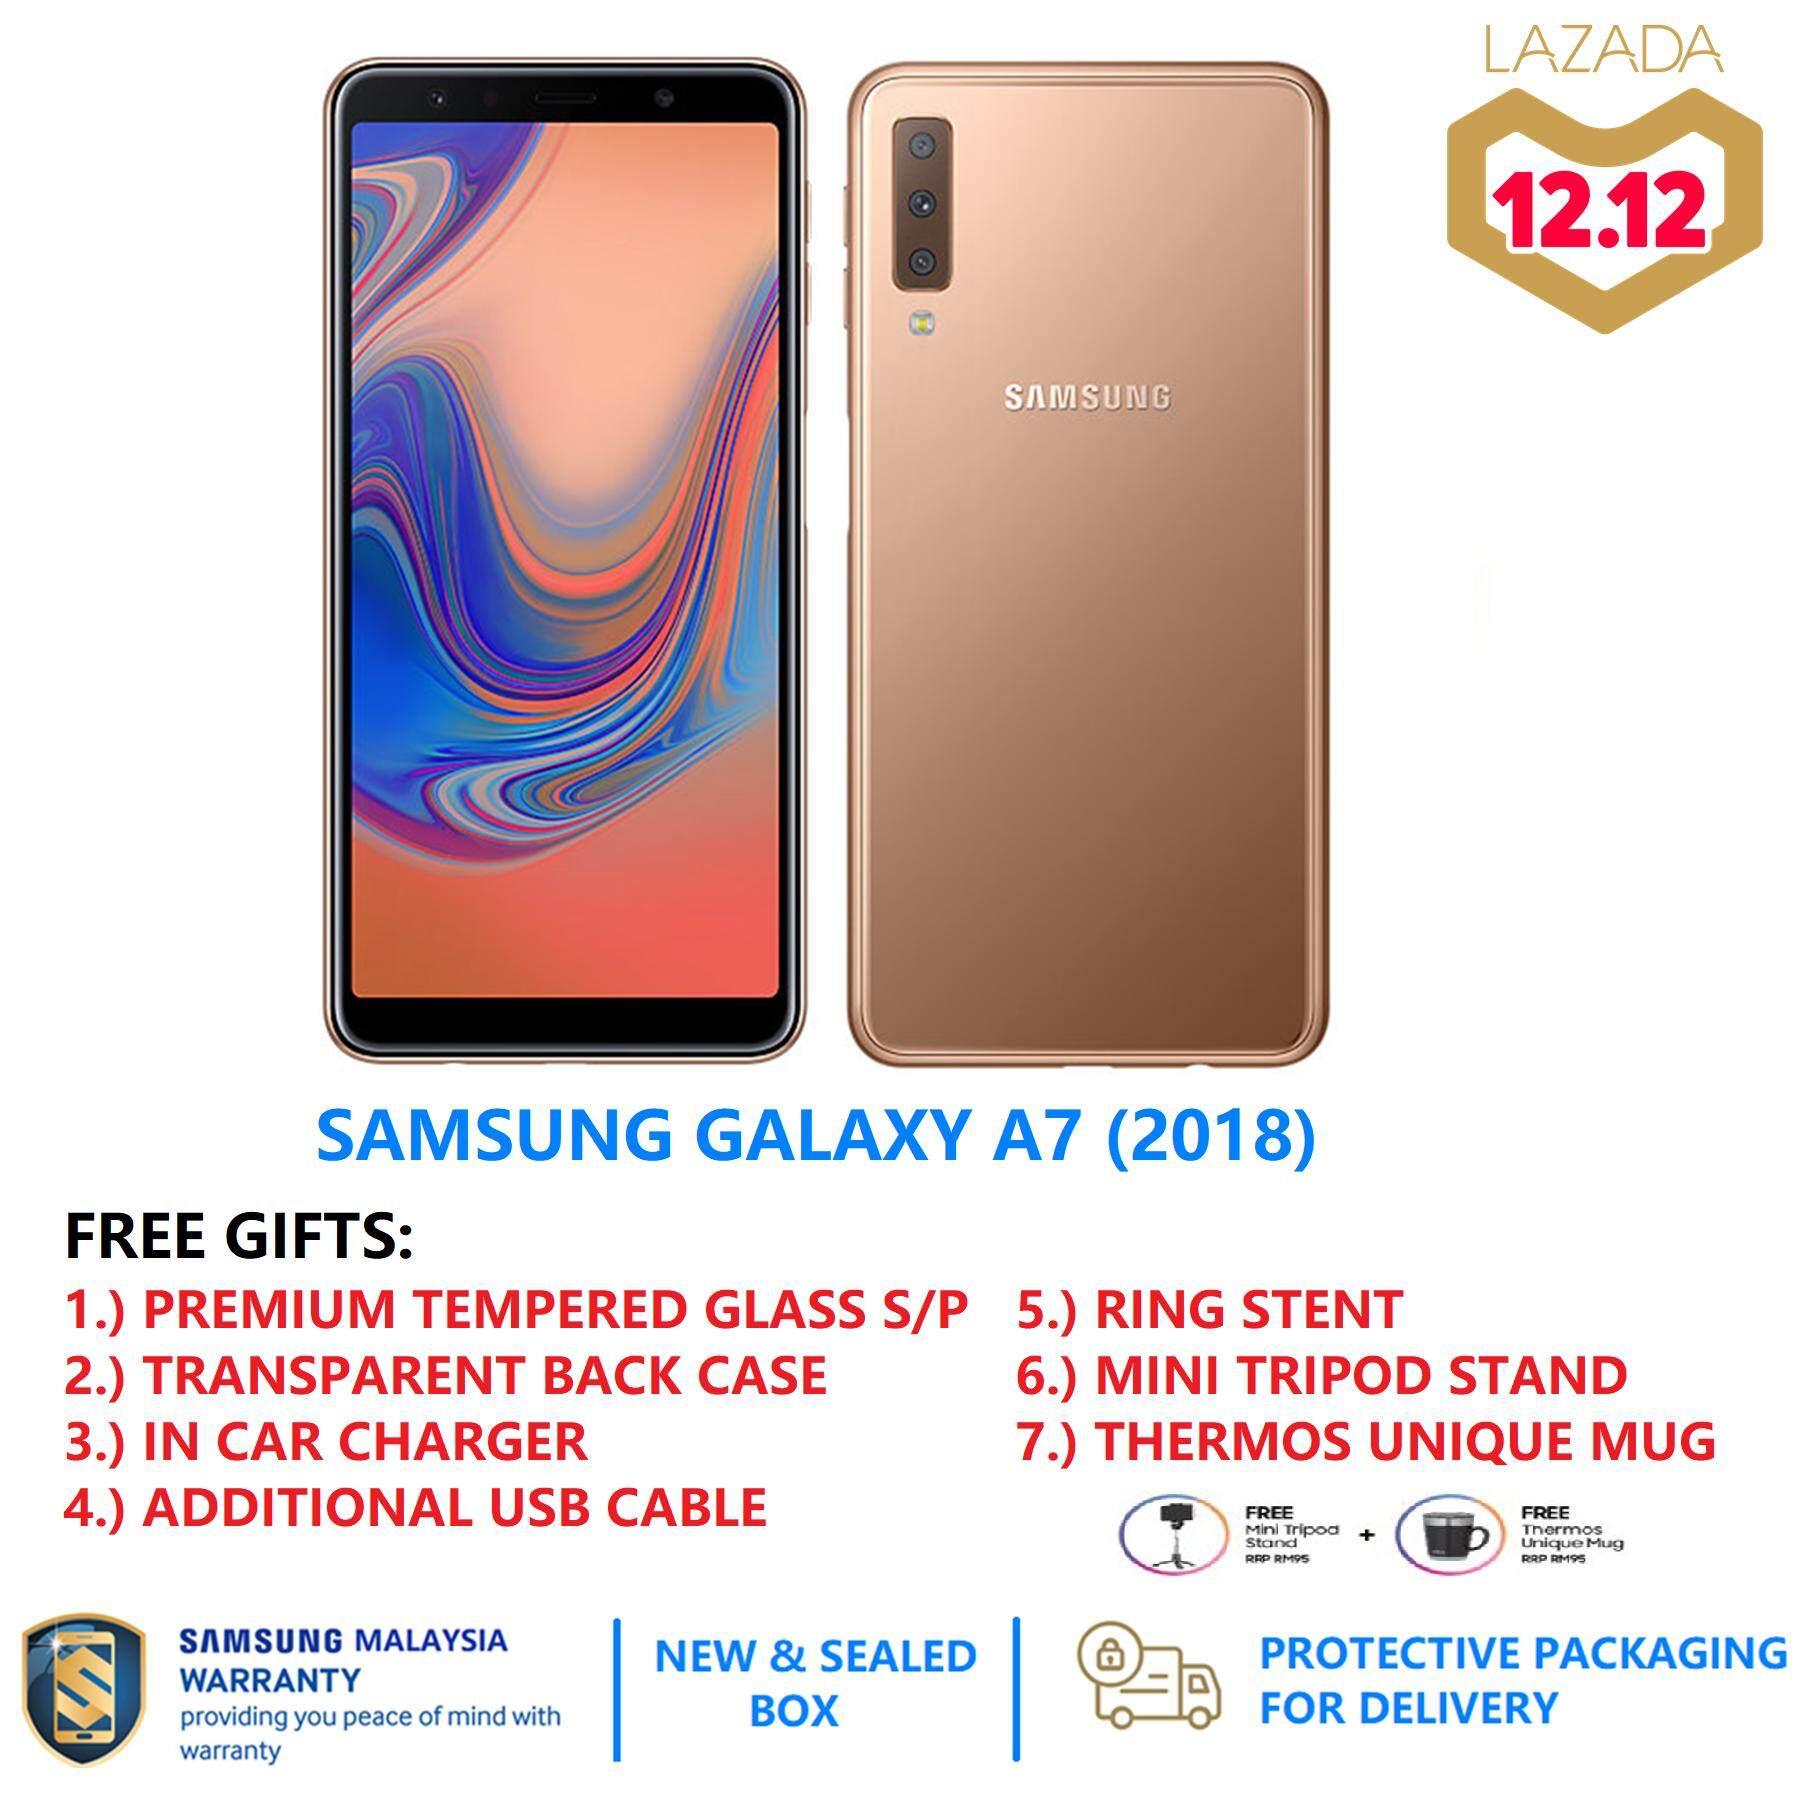 Info Harga Samsung Galaxy J7 Core 16gb Hitam Termurah 2018 Lte Grab Original Mobiles Tablets On Lazada My Free Gifts A7